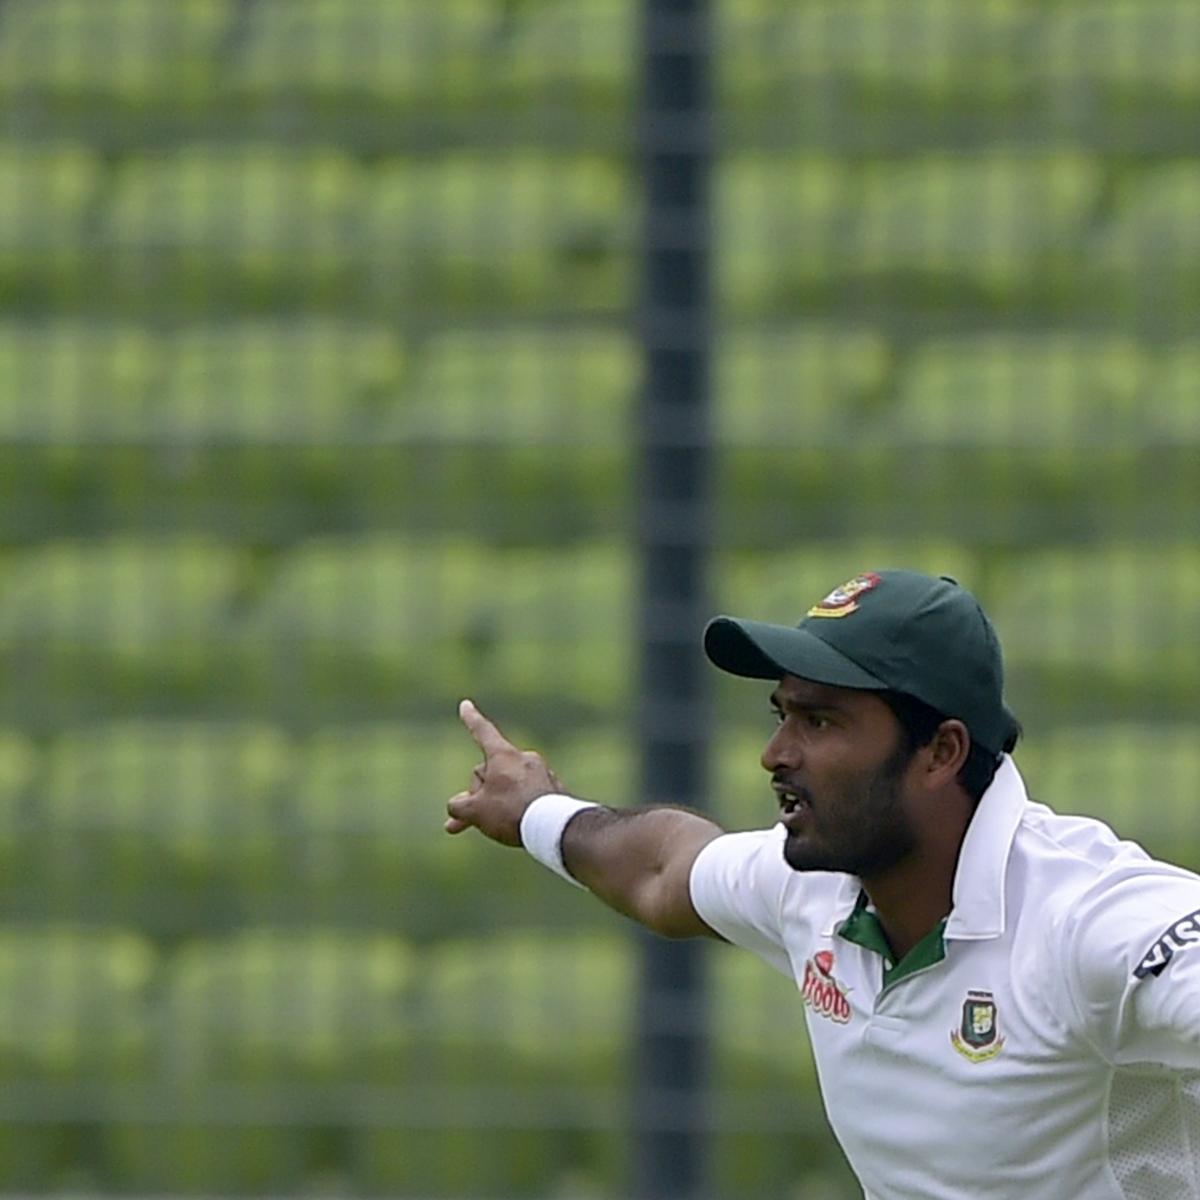 Bangladesh bowler Shahadat Hossain assaults teammate, banned for five years